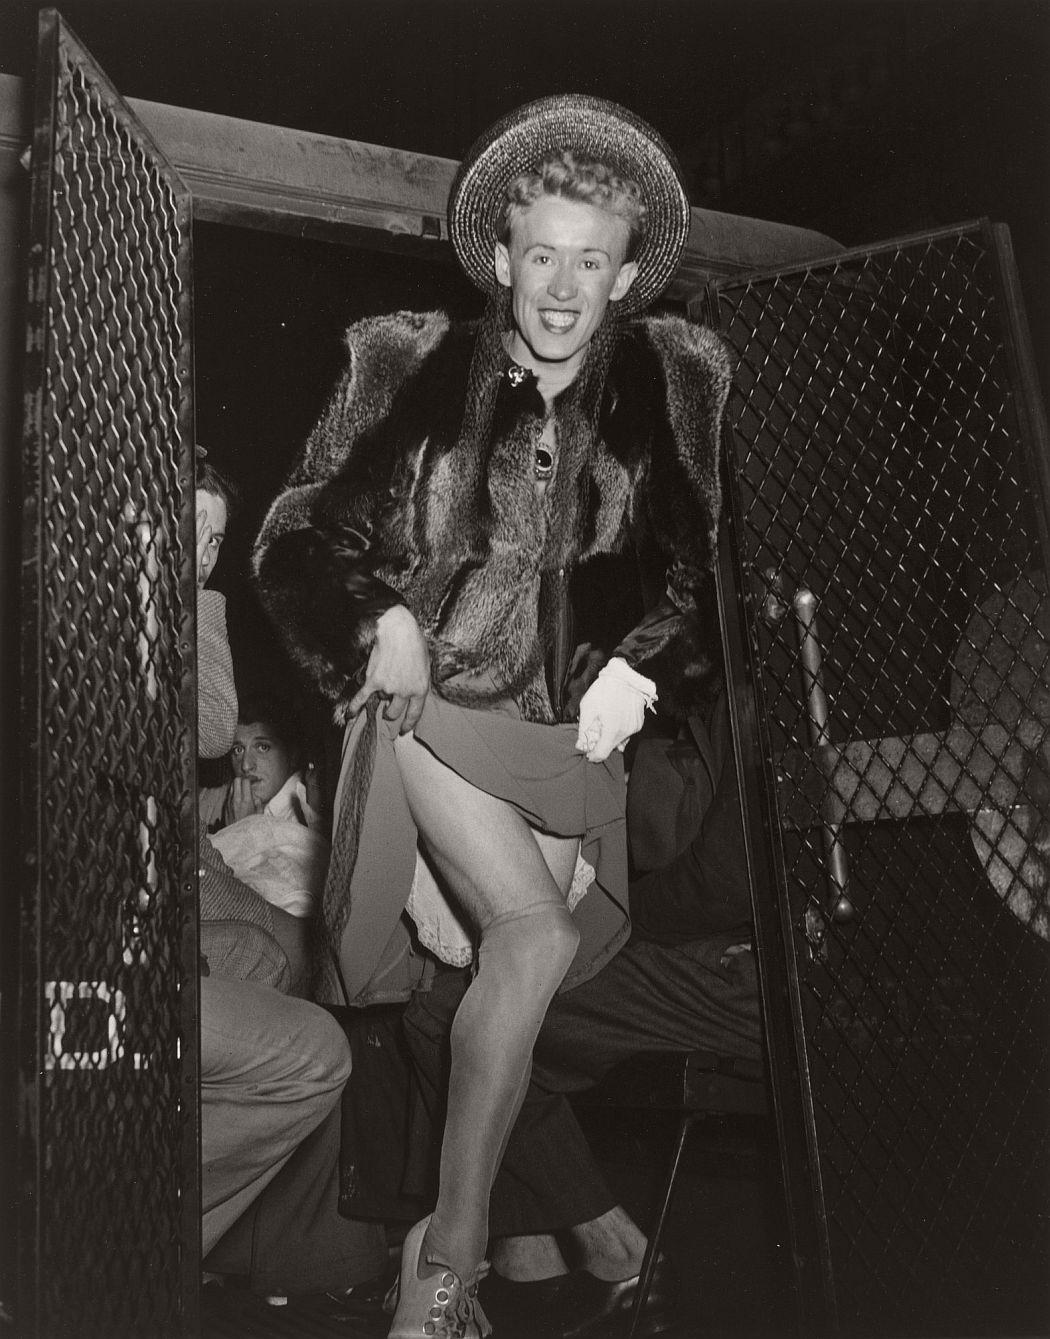 Weegee (American, born Austria. 1899–1968). The Gay Deceiver. c. 1939. Gelatin silver print, 13 × 10 1/4″ (33 × 26 cm). The Museum of Modern Art, New York. Promised gift of Robert B. Menschel. © Weegee/International Center of Photography